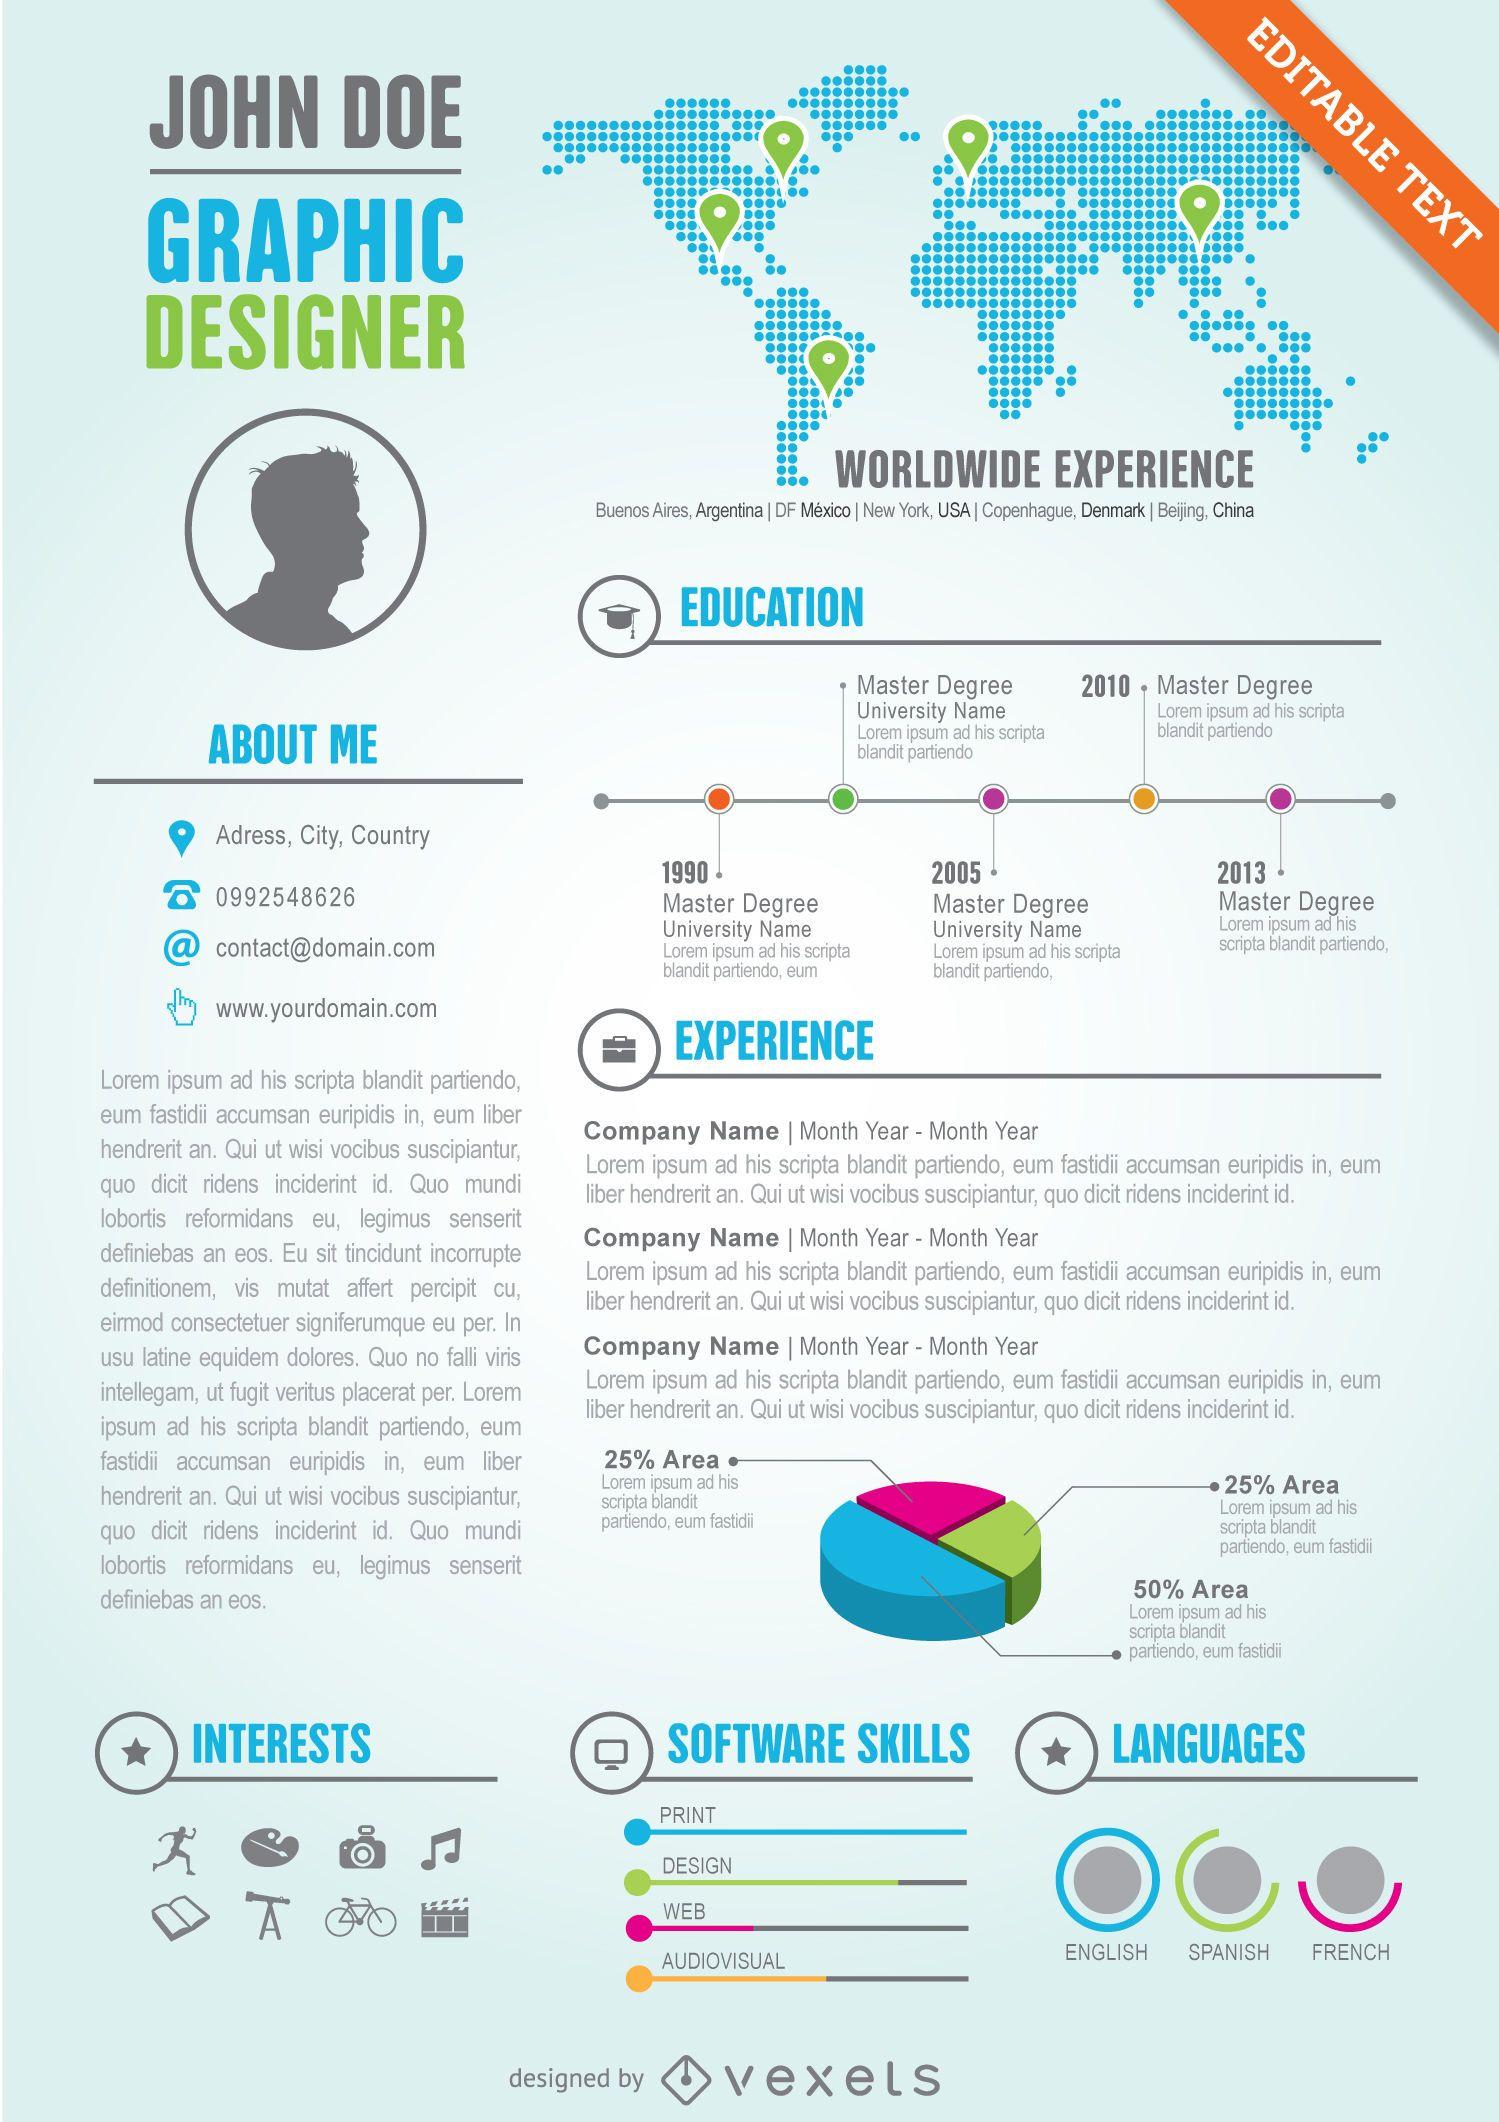 Graphic Designer Editable Resume Cv Template Vector Download